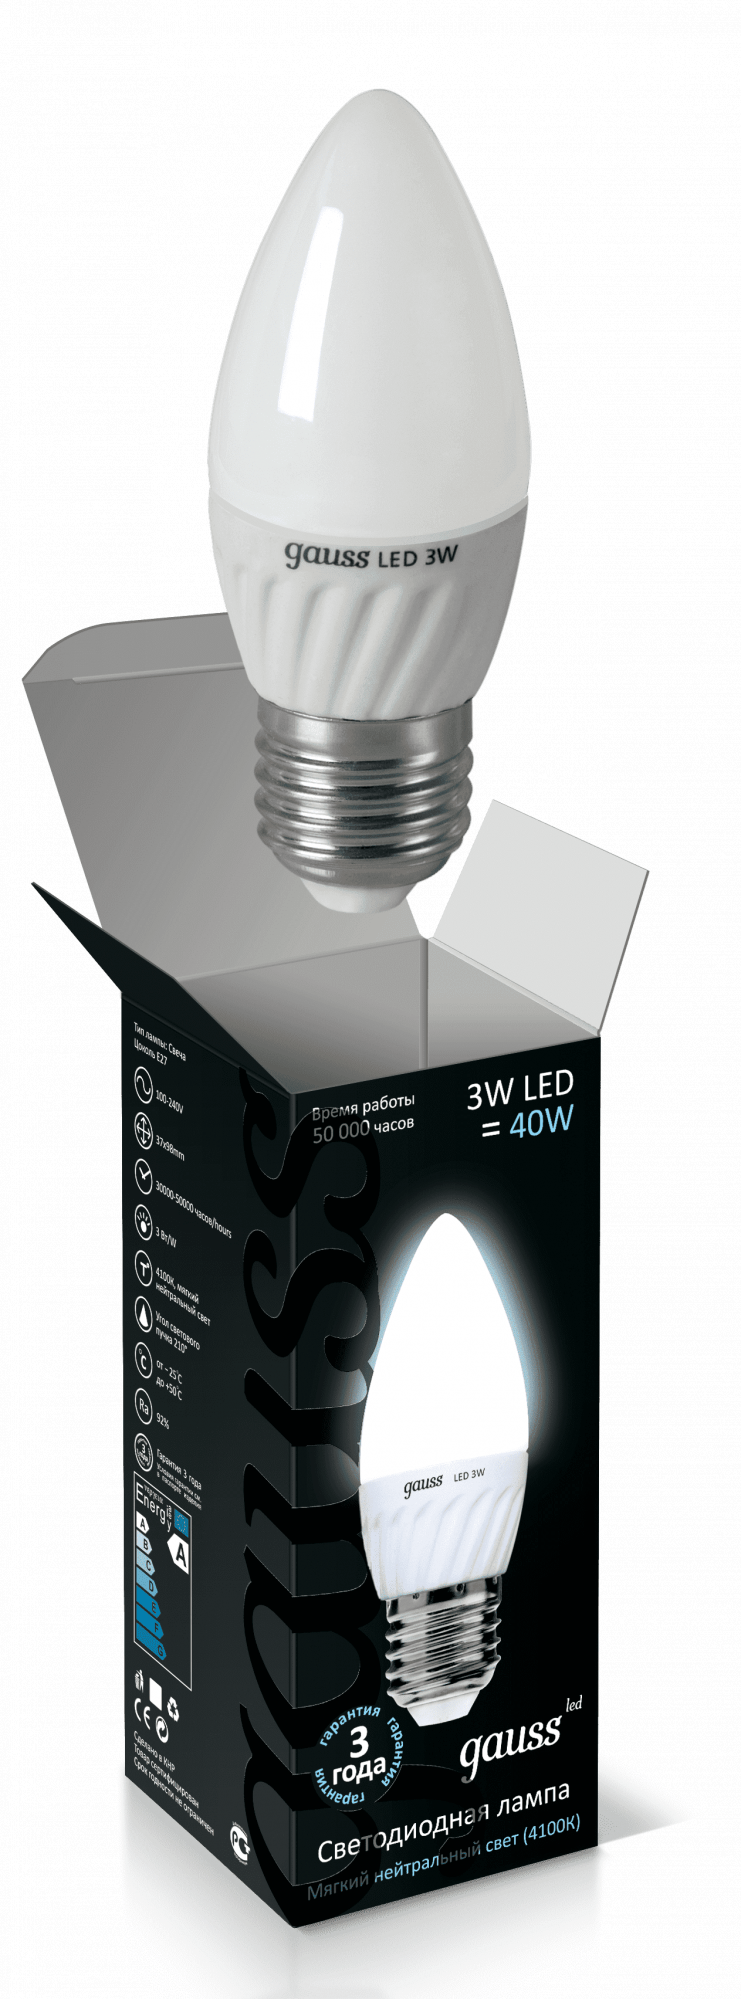 Gauss LED Ceramic Candle 3W E27 4100K арт. EB103302203